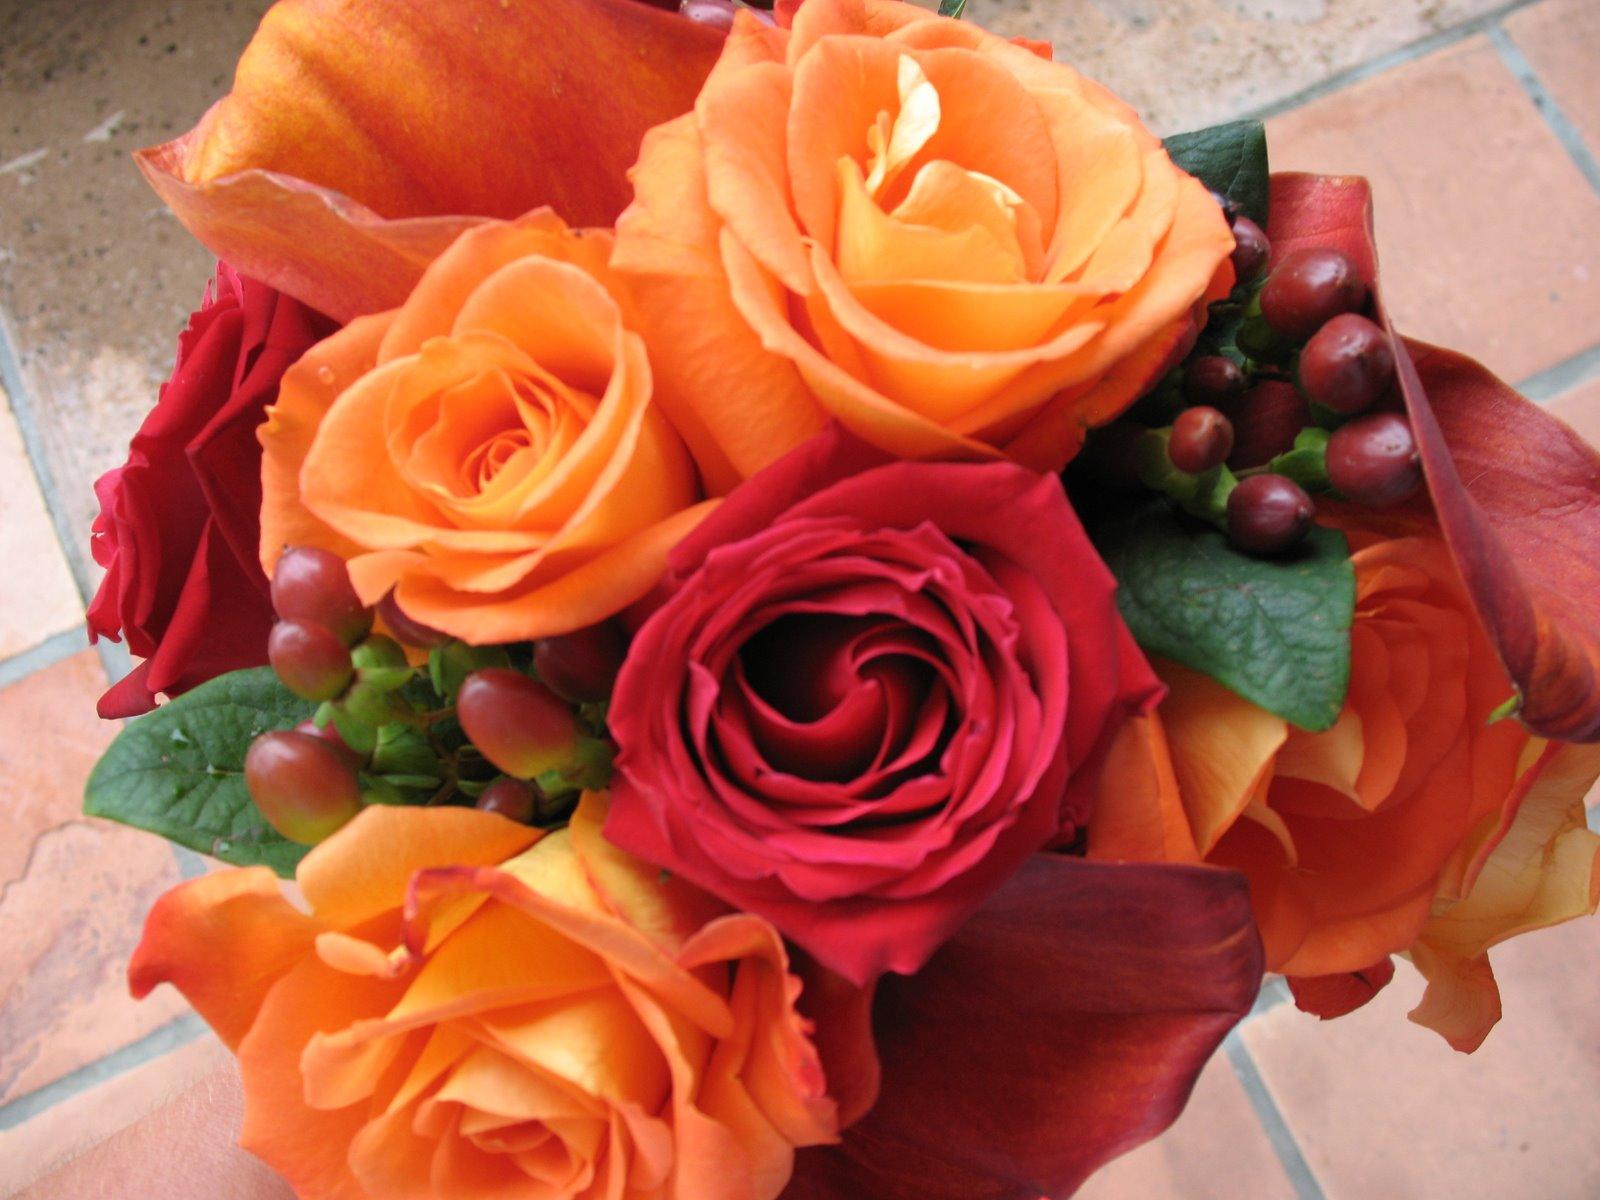 Bicoastal Bride: Wedding Florist Q&A – Part Two